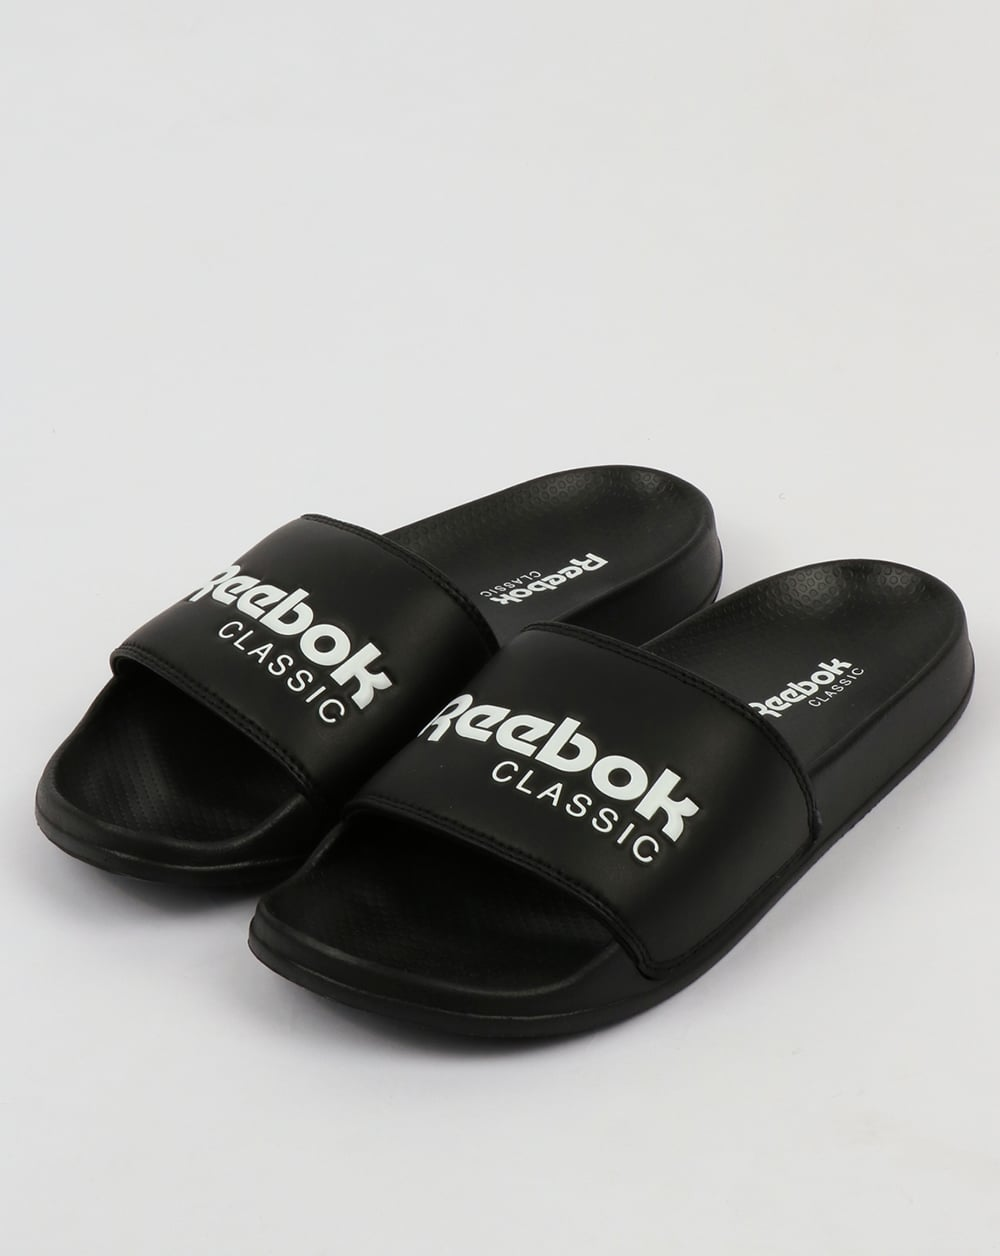 de96b055078f Reebok Reebok Classic Sliders Black